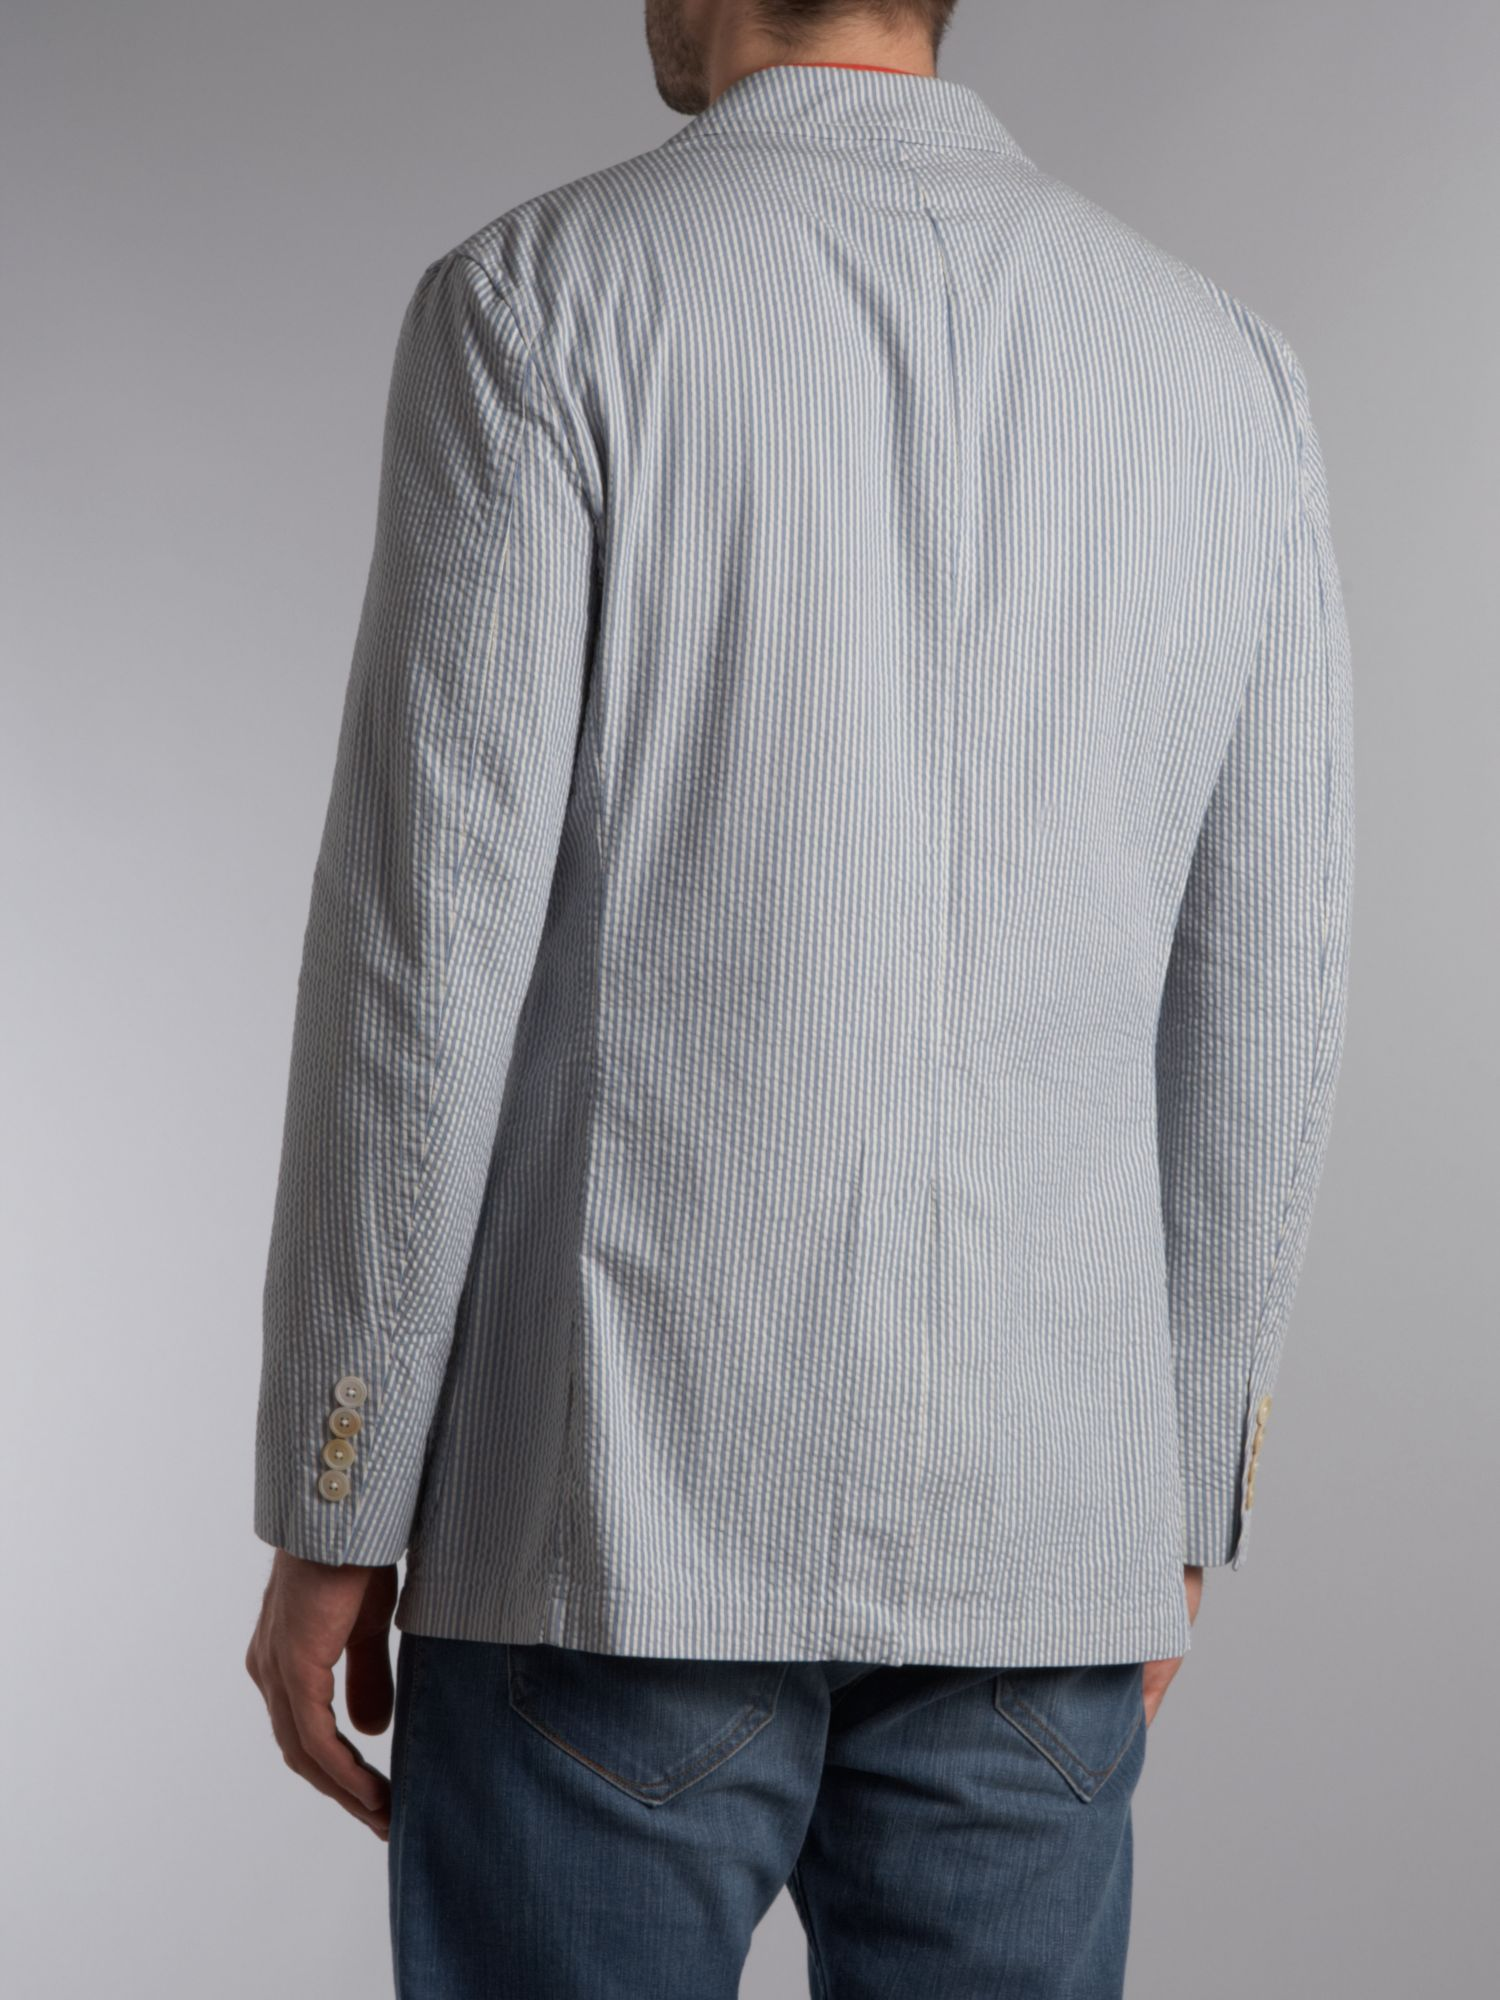 Mens Long Sleeve Seersucker Shirts